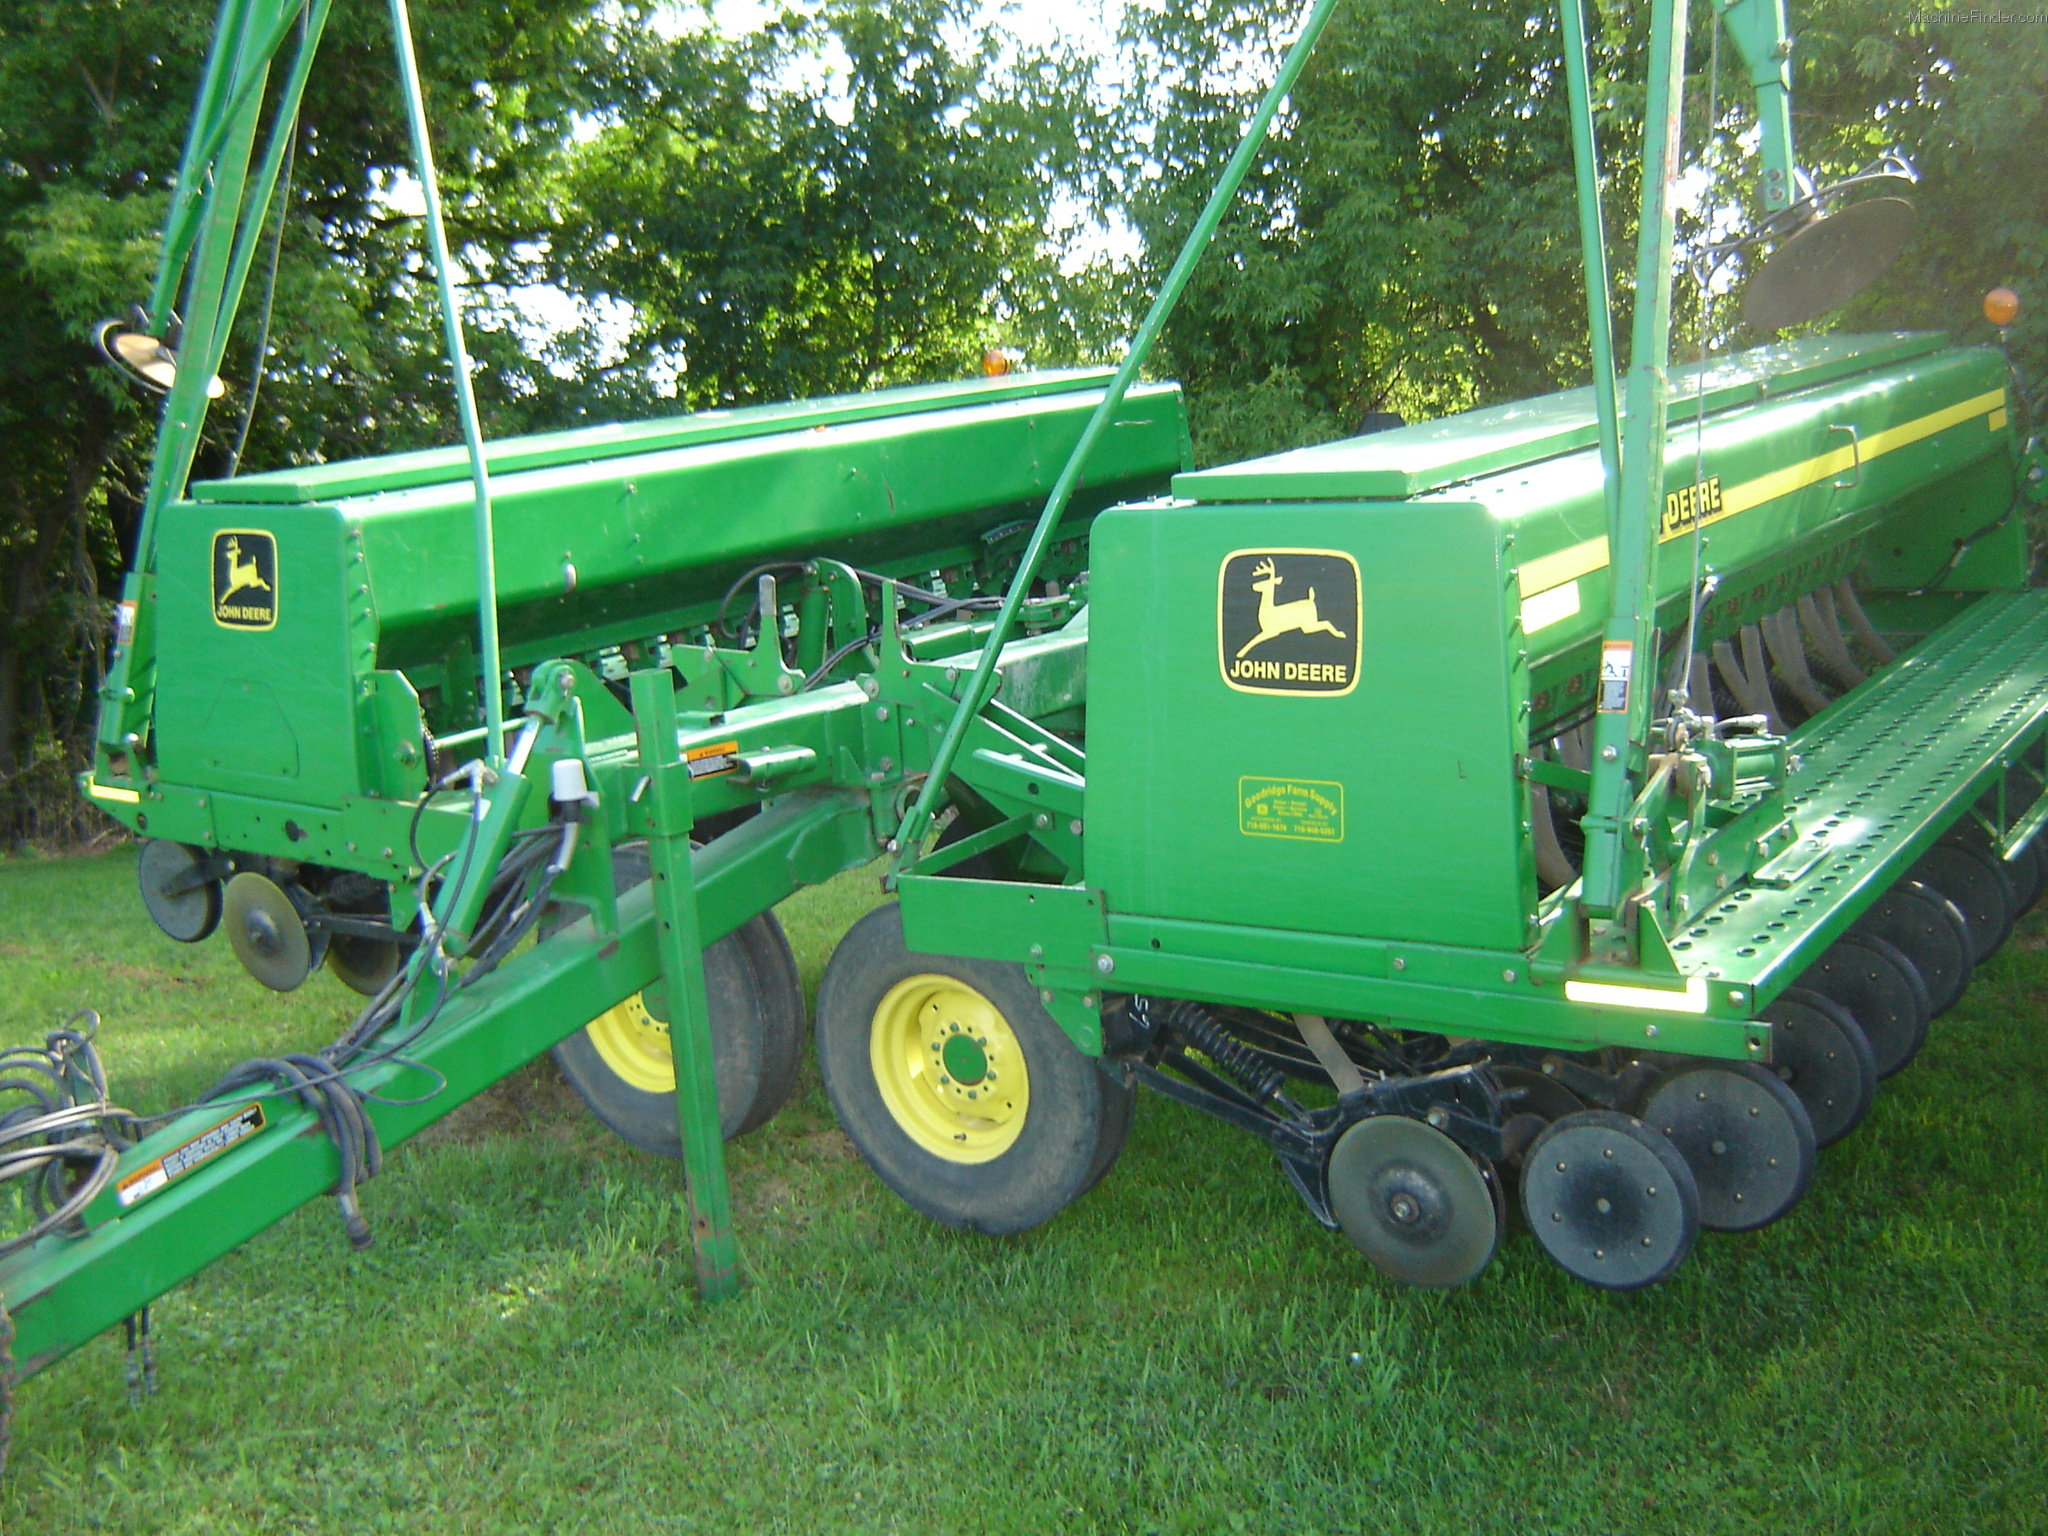 2000 John Deere 455 Planting & Seeding - Box Drills - John ...